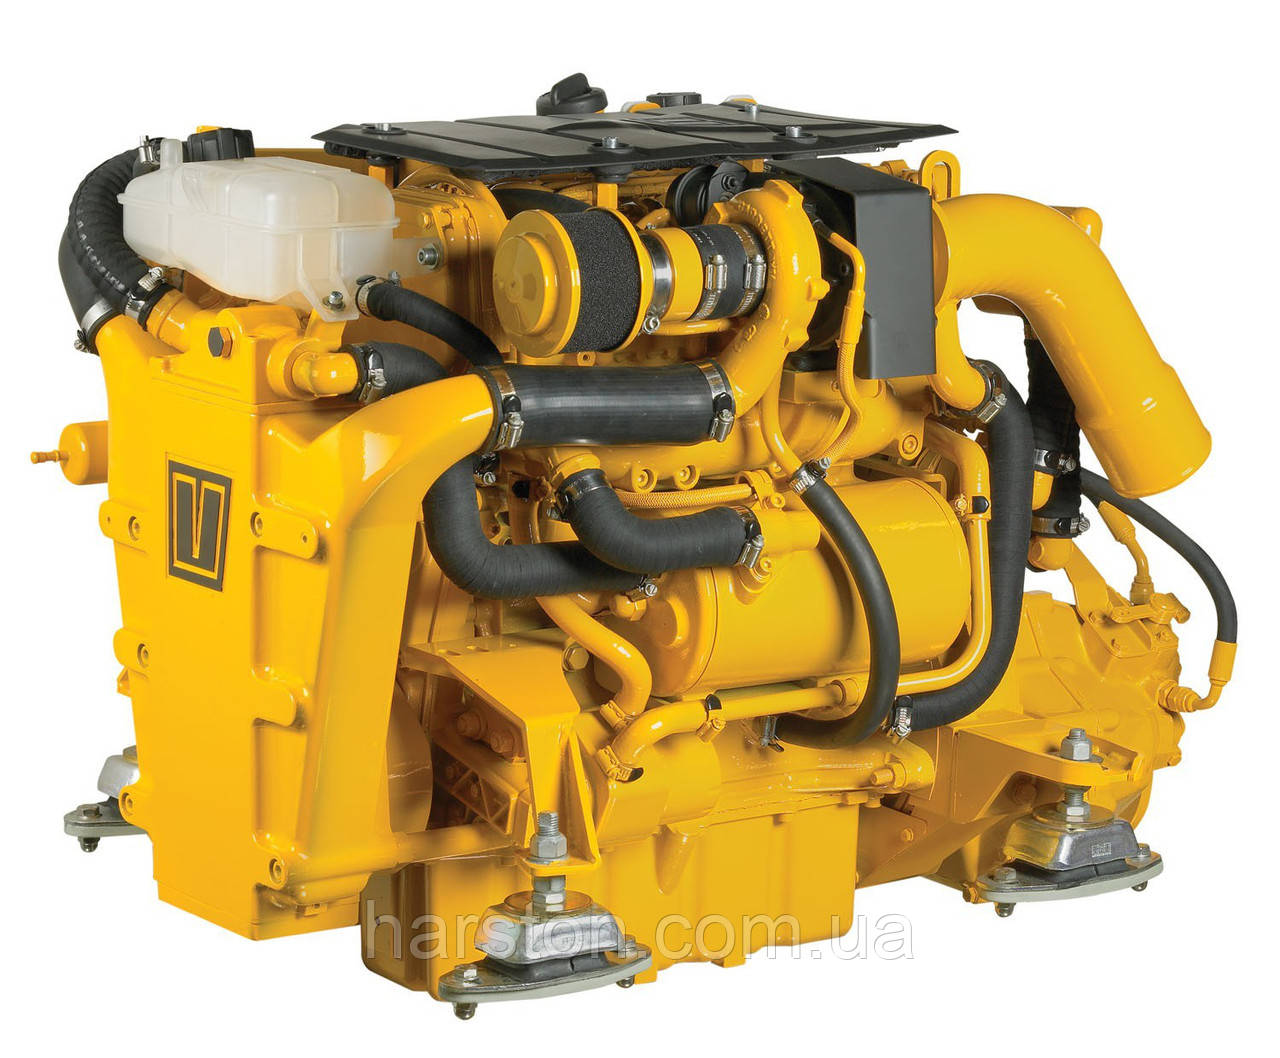 Двигатель для яхты VETUS ENGINE VF4.140E 12V/1P SKU: VF4140G